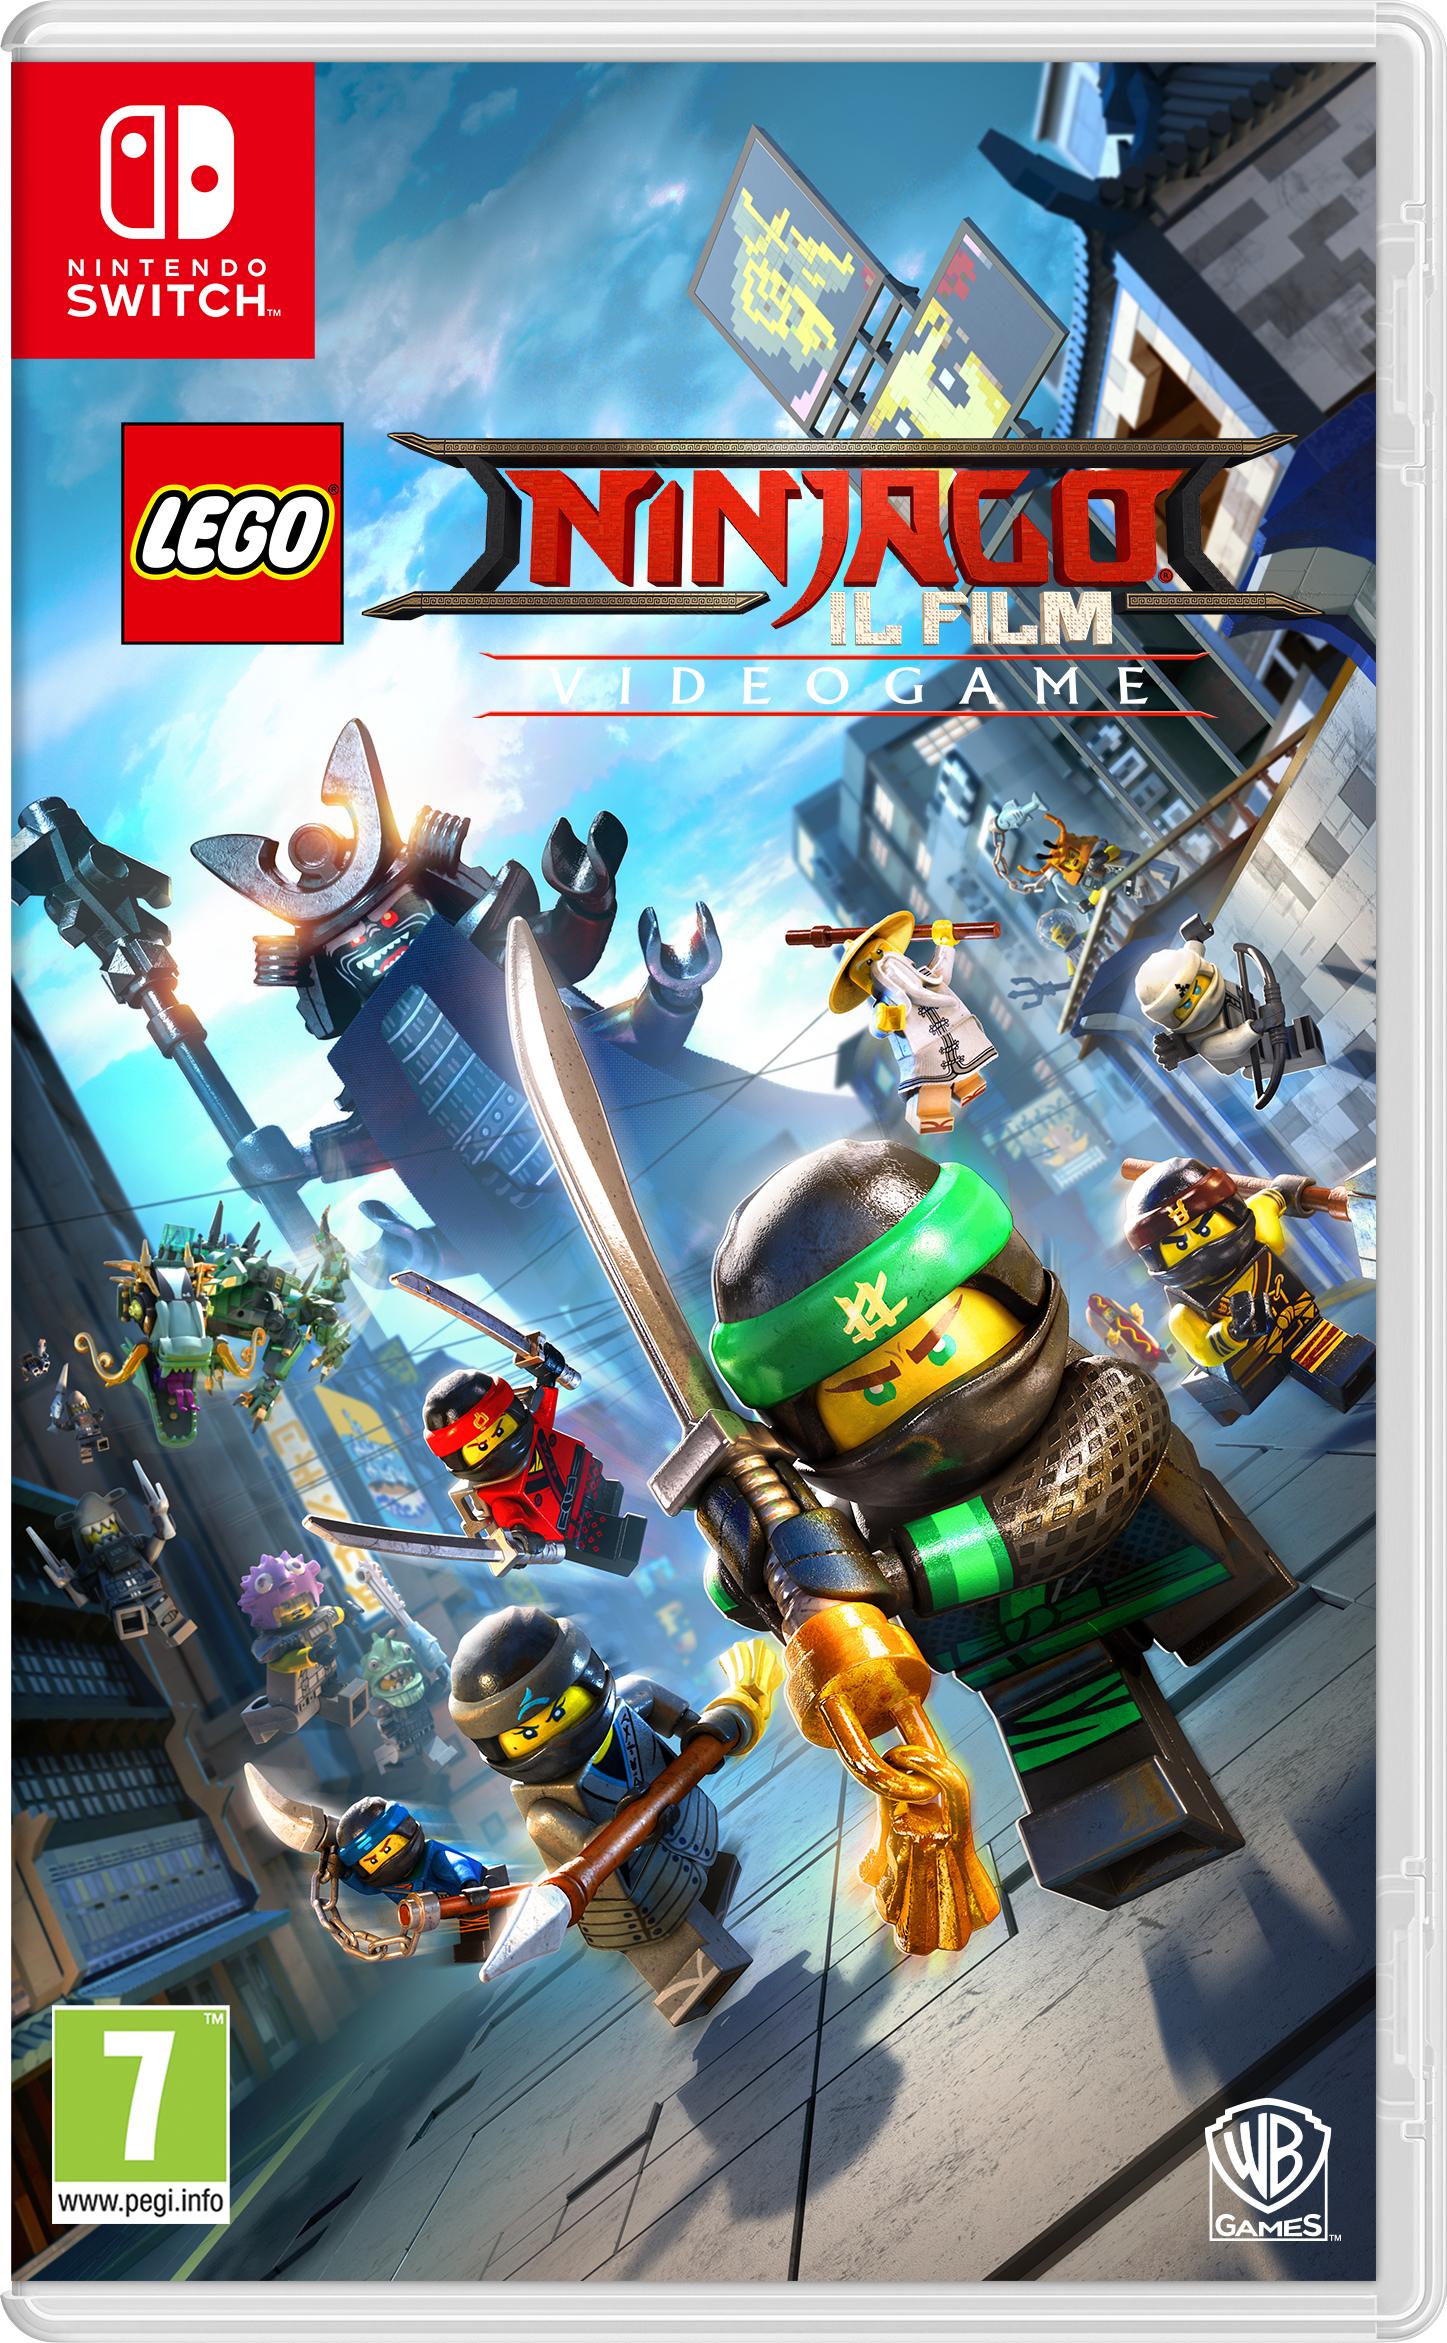 Warner Bros Game Legi Ninjago The Movie The LEGO Ninjago Il Film - 1000691203